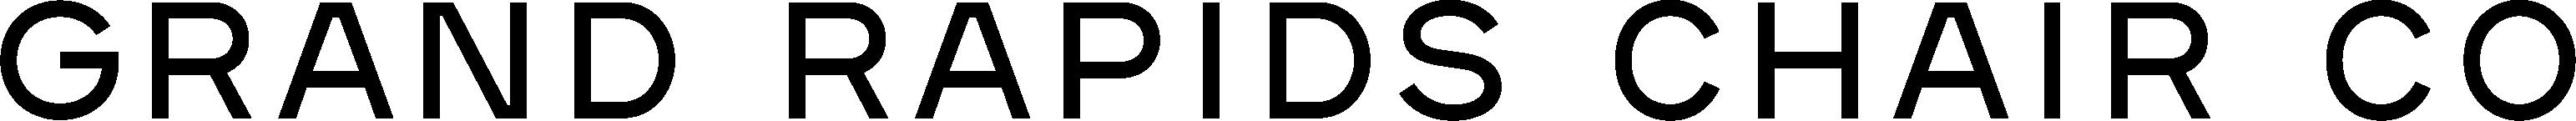 grand rapids chair co logo